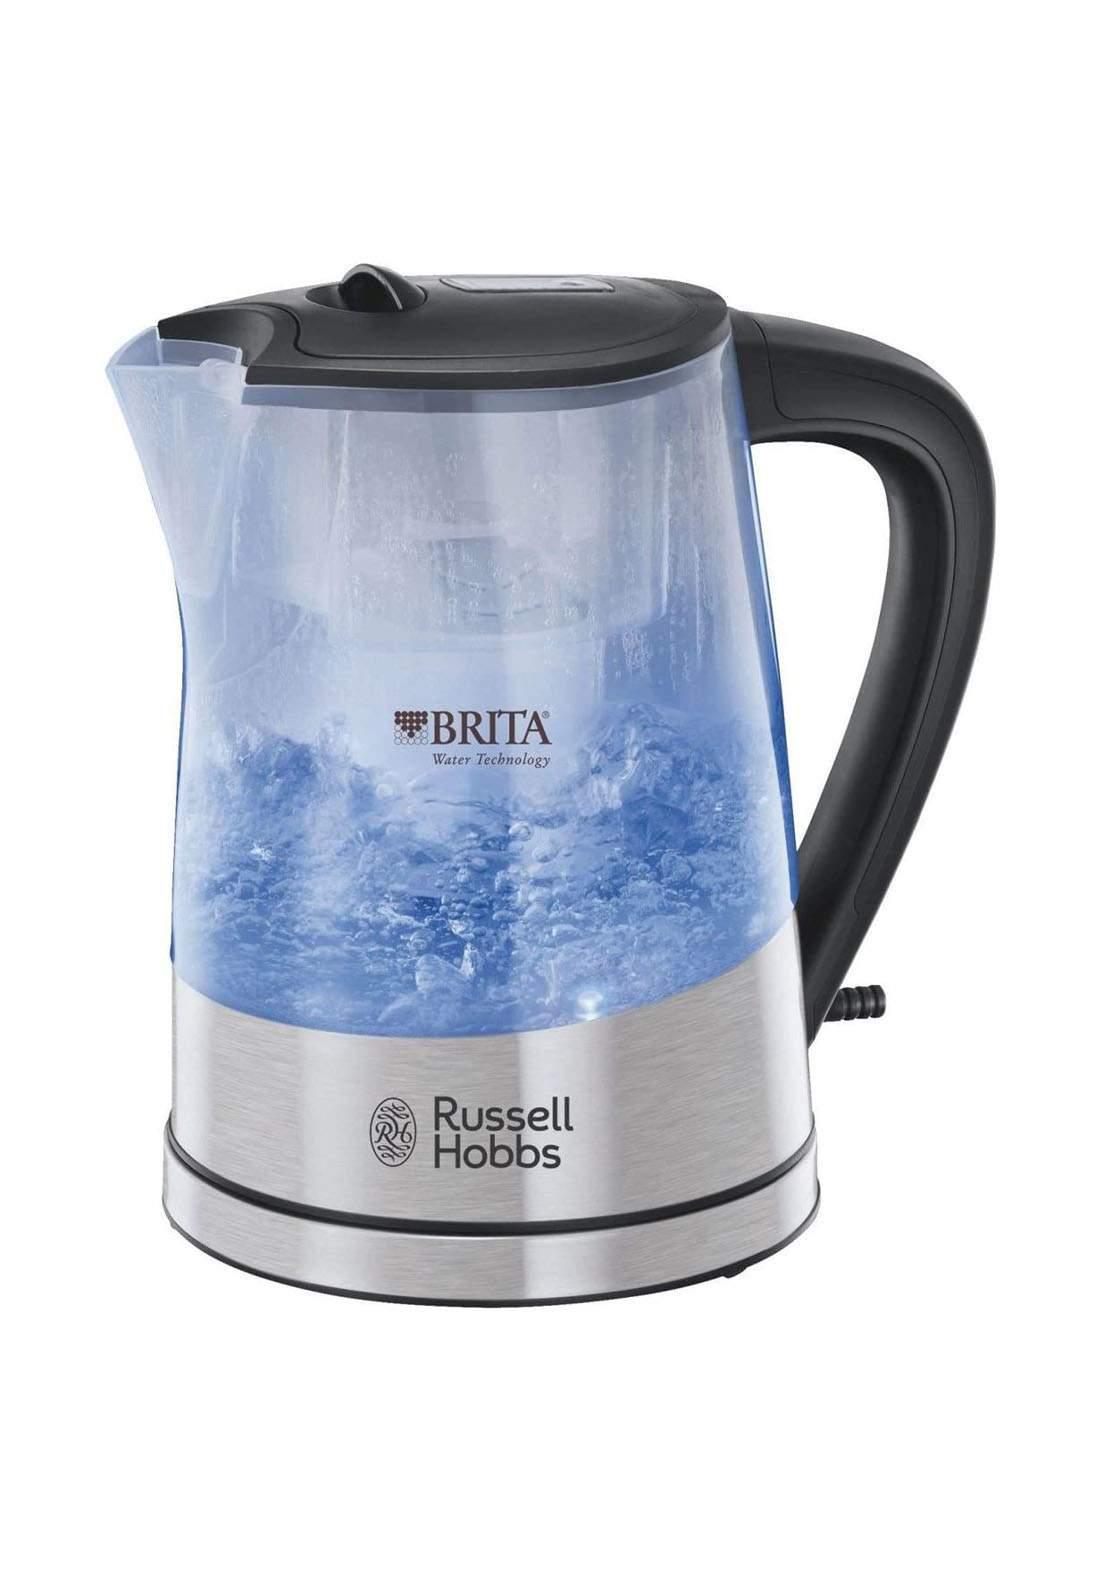 Russell hobbs 22850 Electrical kettle  غلاية